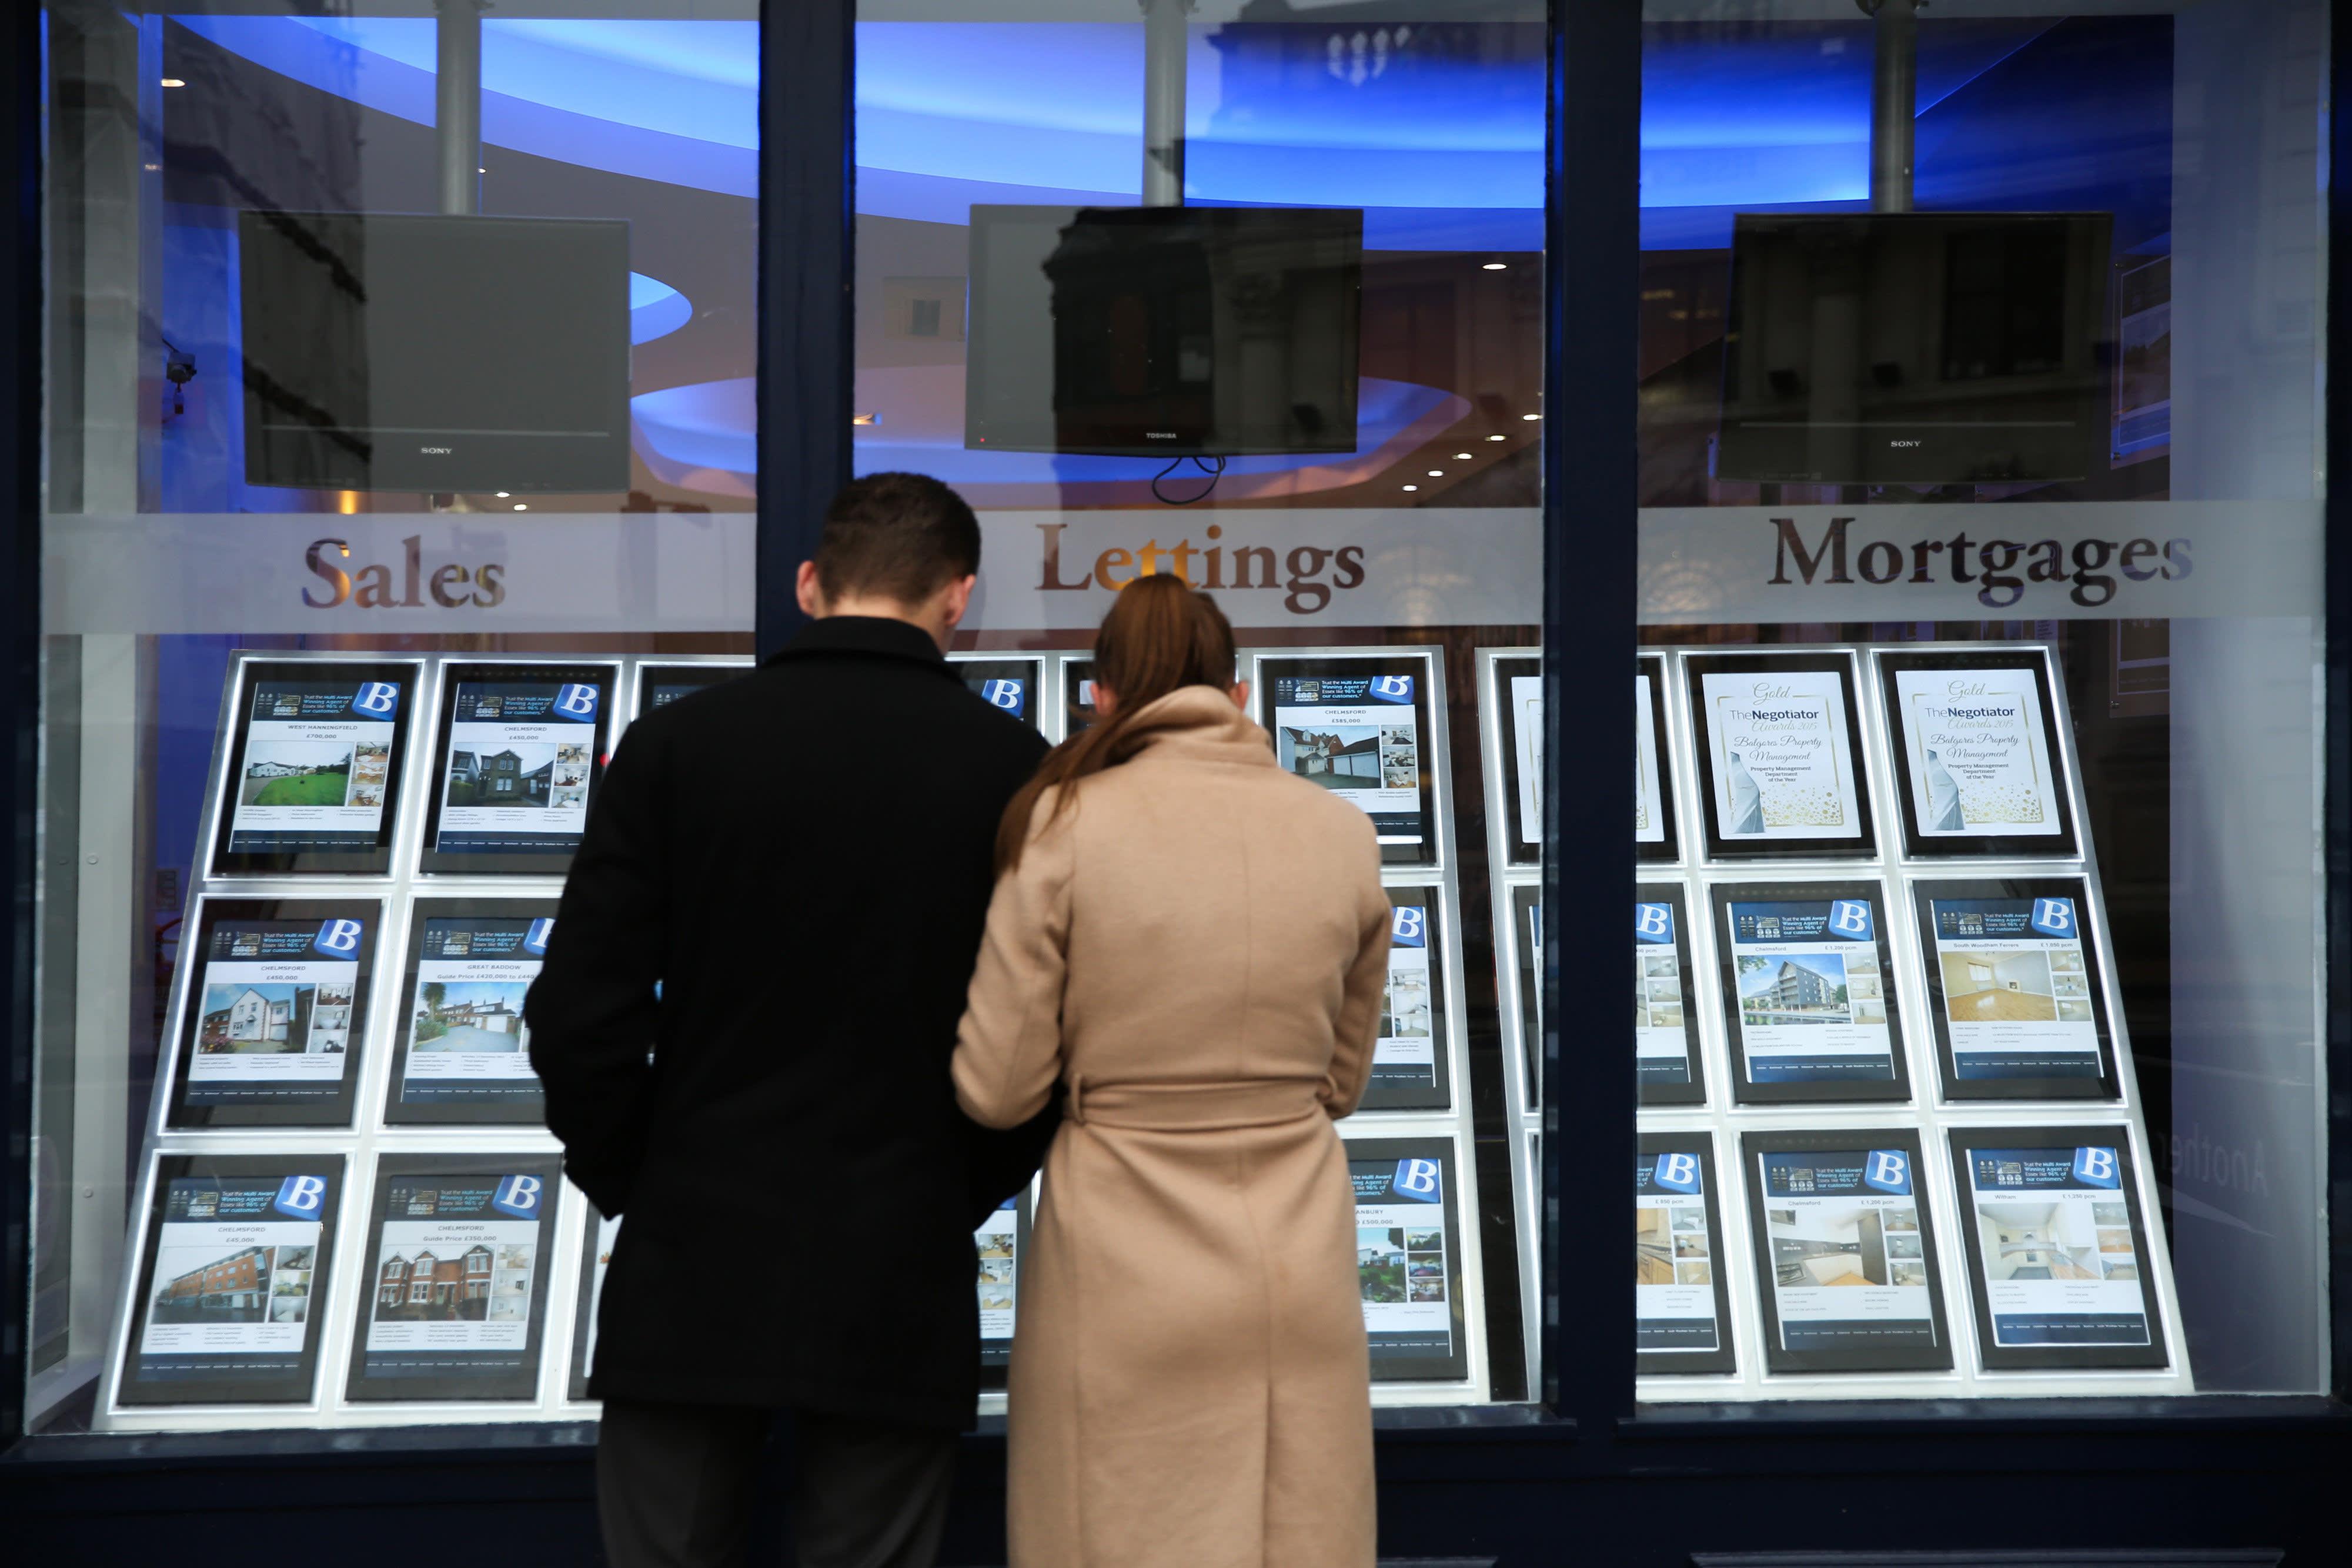 Half of landlords shun rental market amid rule changes